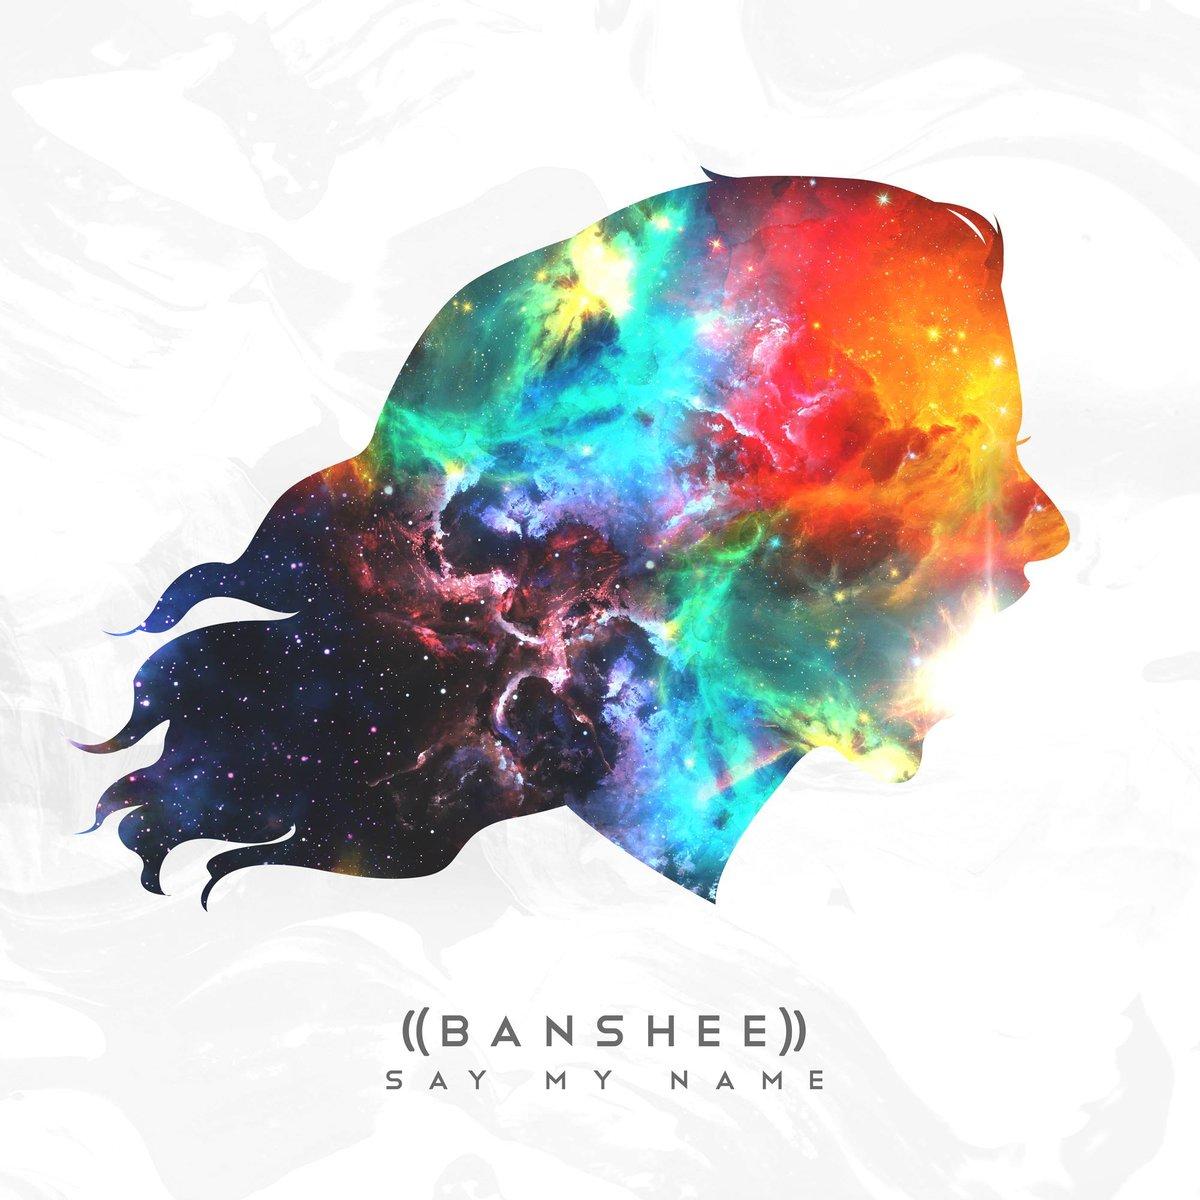 Image of Brand New 'Say My Name' EP.